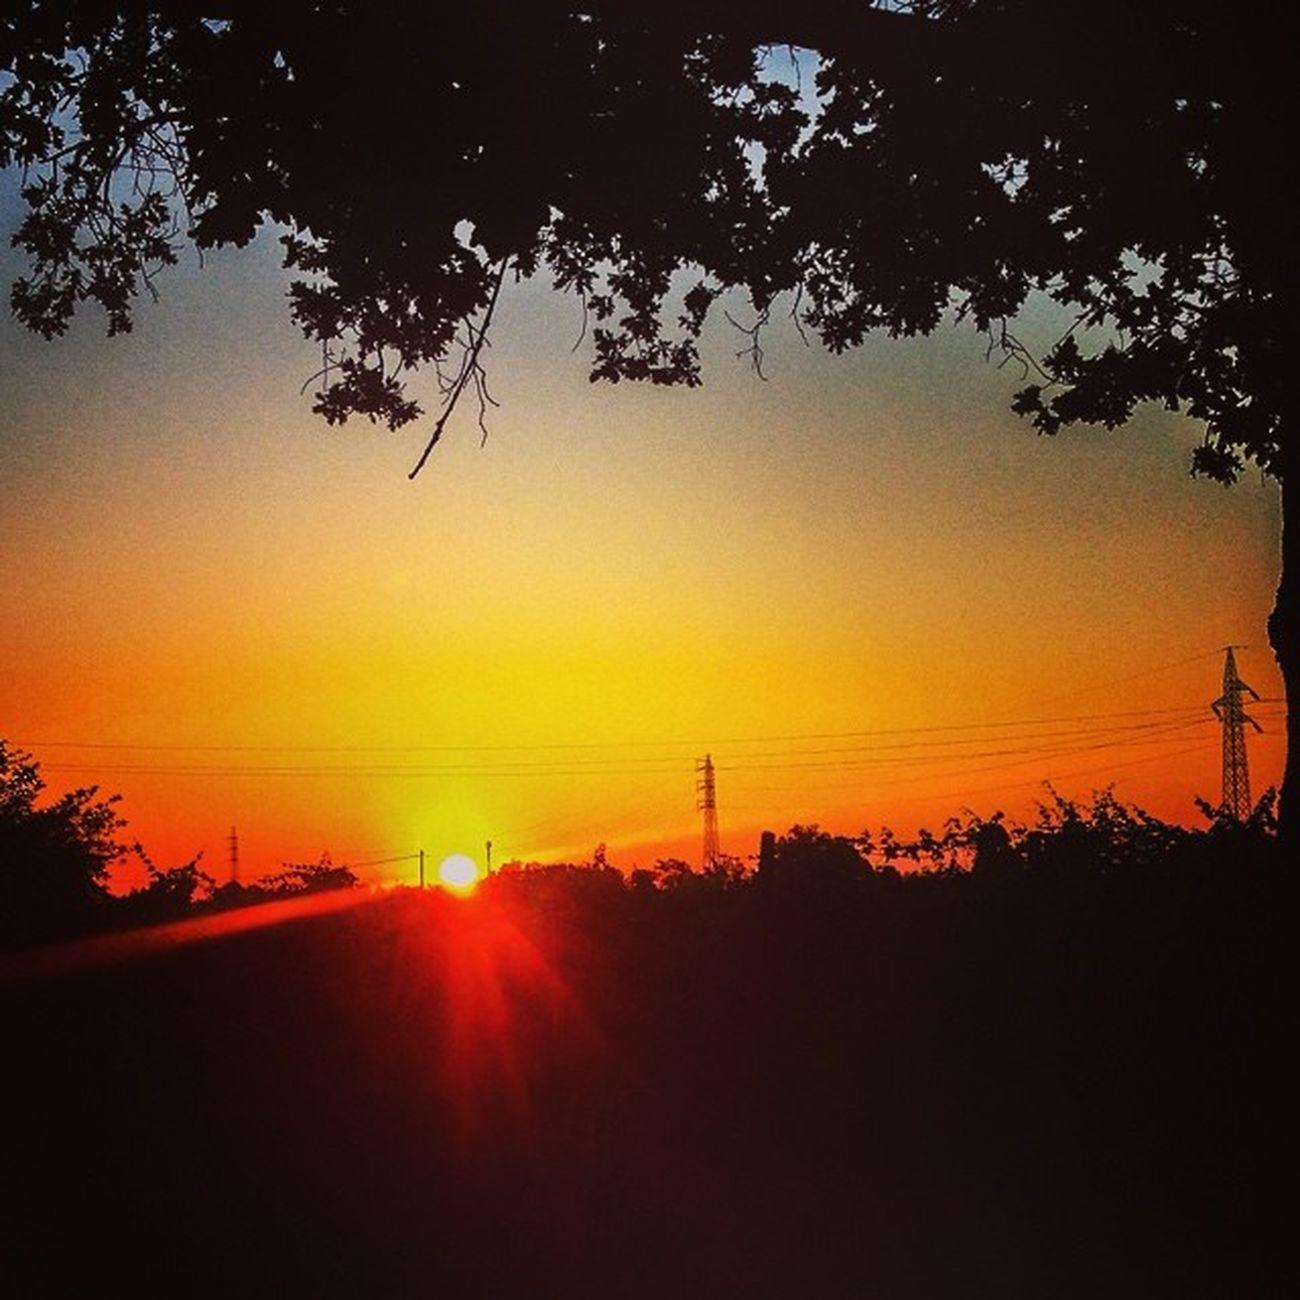 Same sun, totally different landscape! #lifeisbeautiful, anyway! #sunrise #pianurapadana #italy #silhouette #igersreggioemilia #iphonography #instapic #webstapick #meshpics